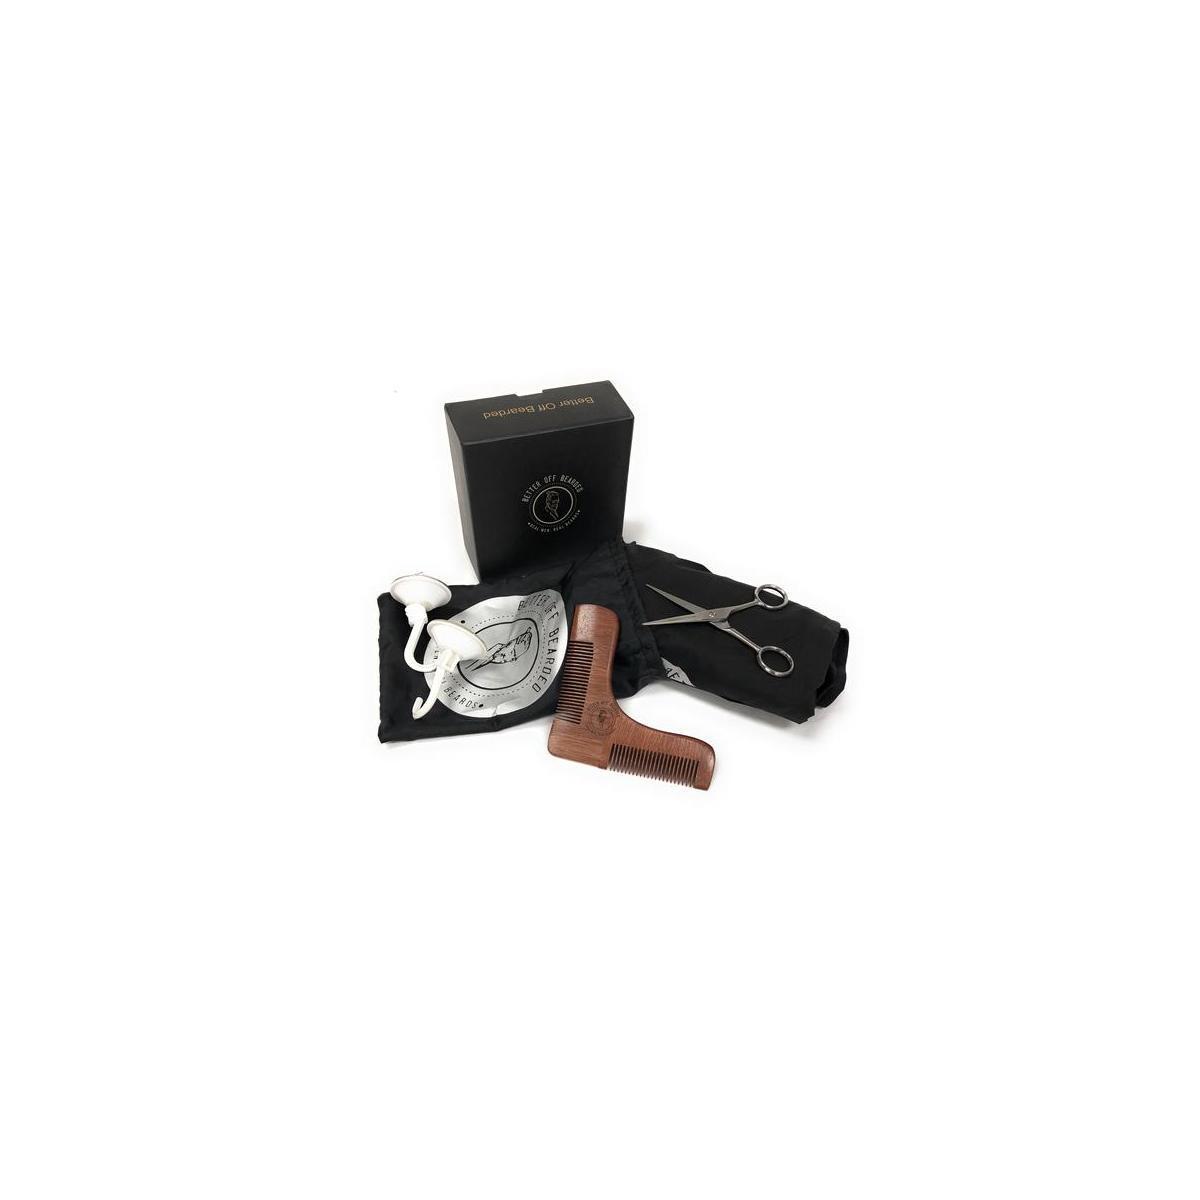 Beard Bib Shaving Apron Kit; Grooming Catcher for Trimming and Shaving Includes Premium Sandal Wooded Shaping Tool, Scissors, Storage/Travel Bag, and Sleek Gift Box